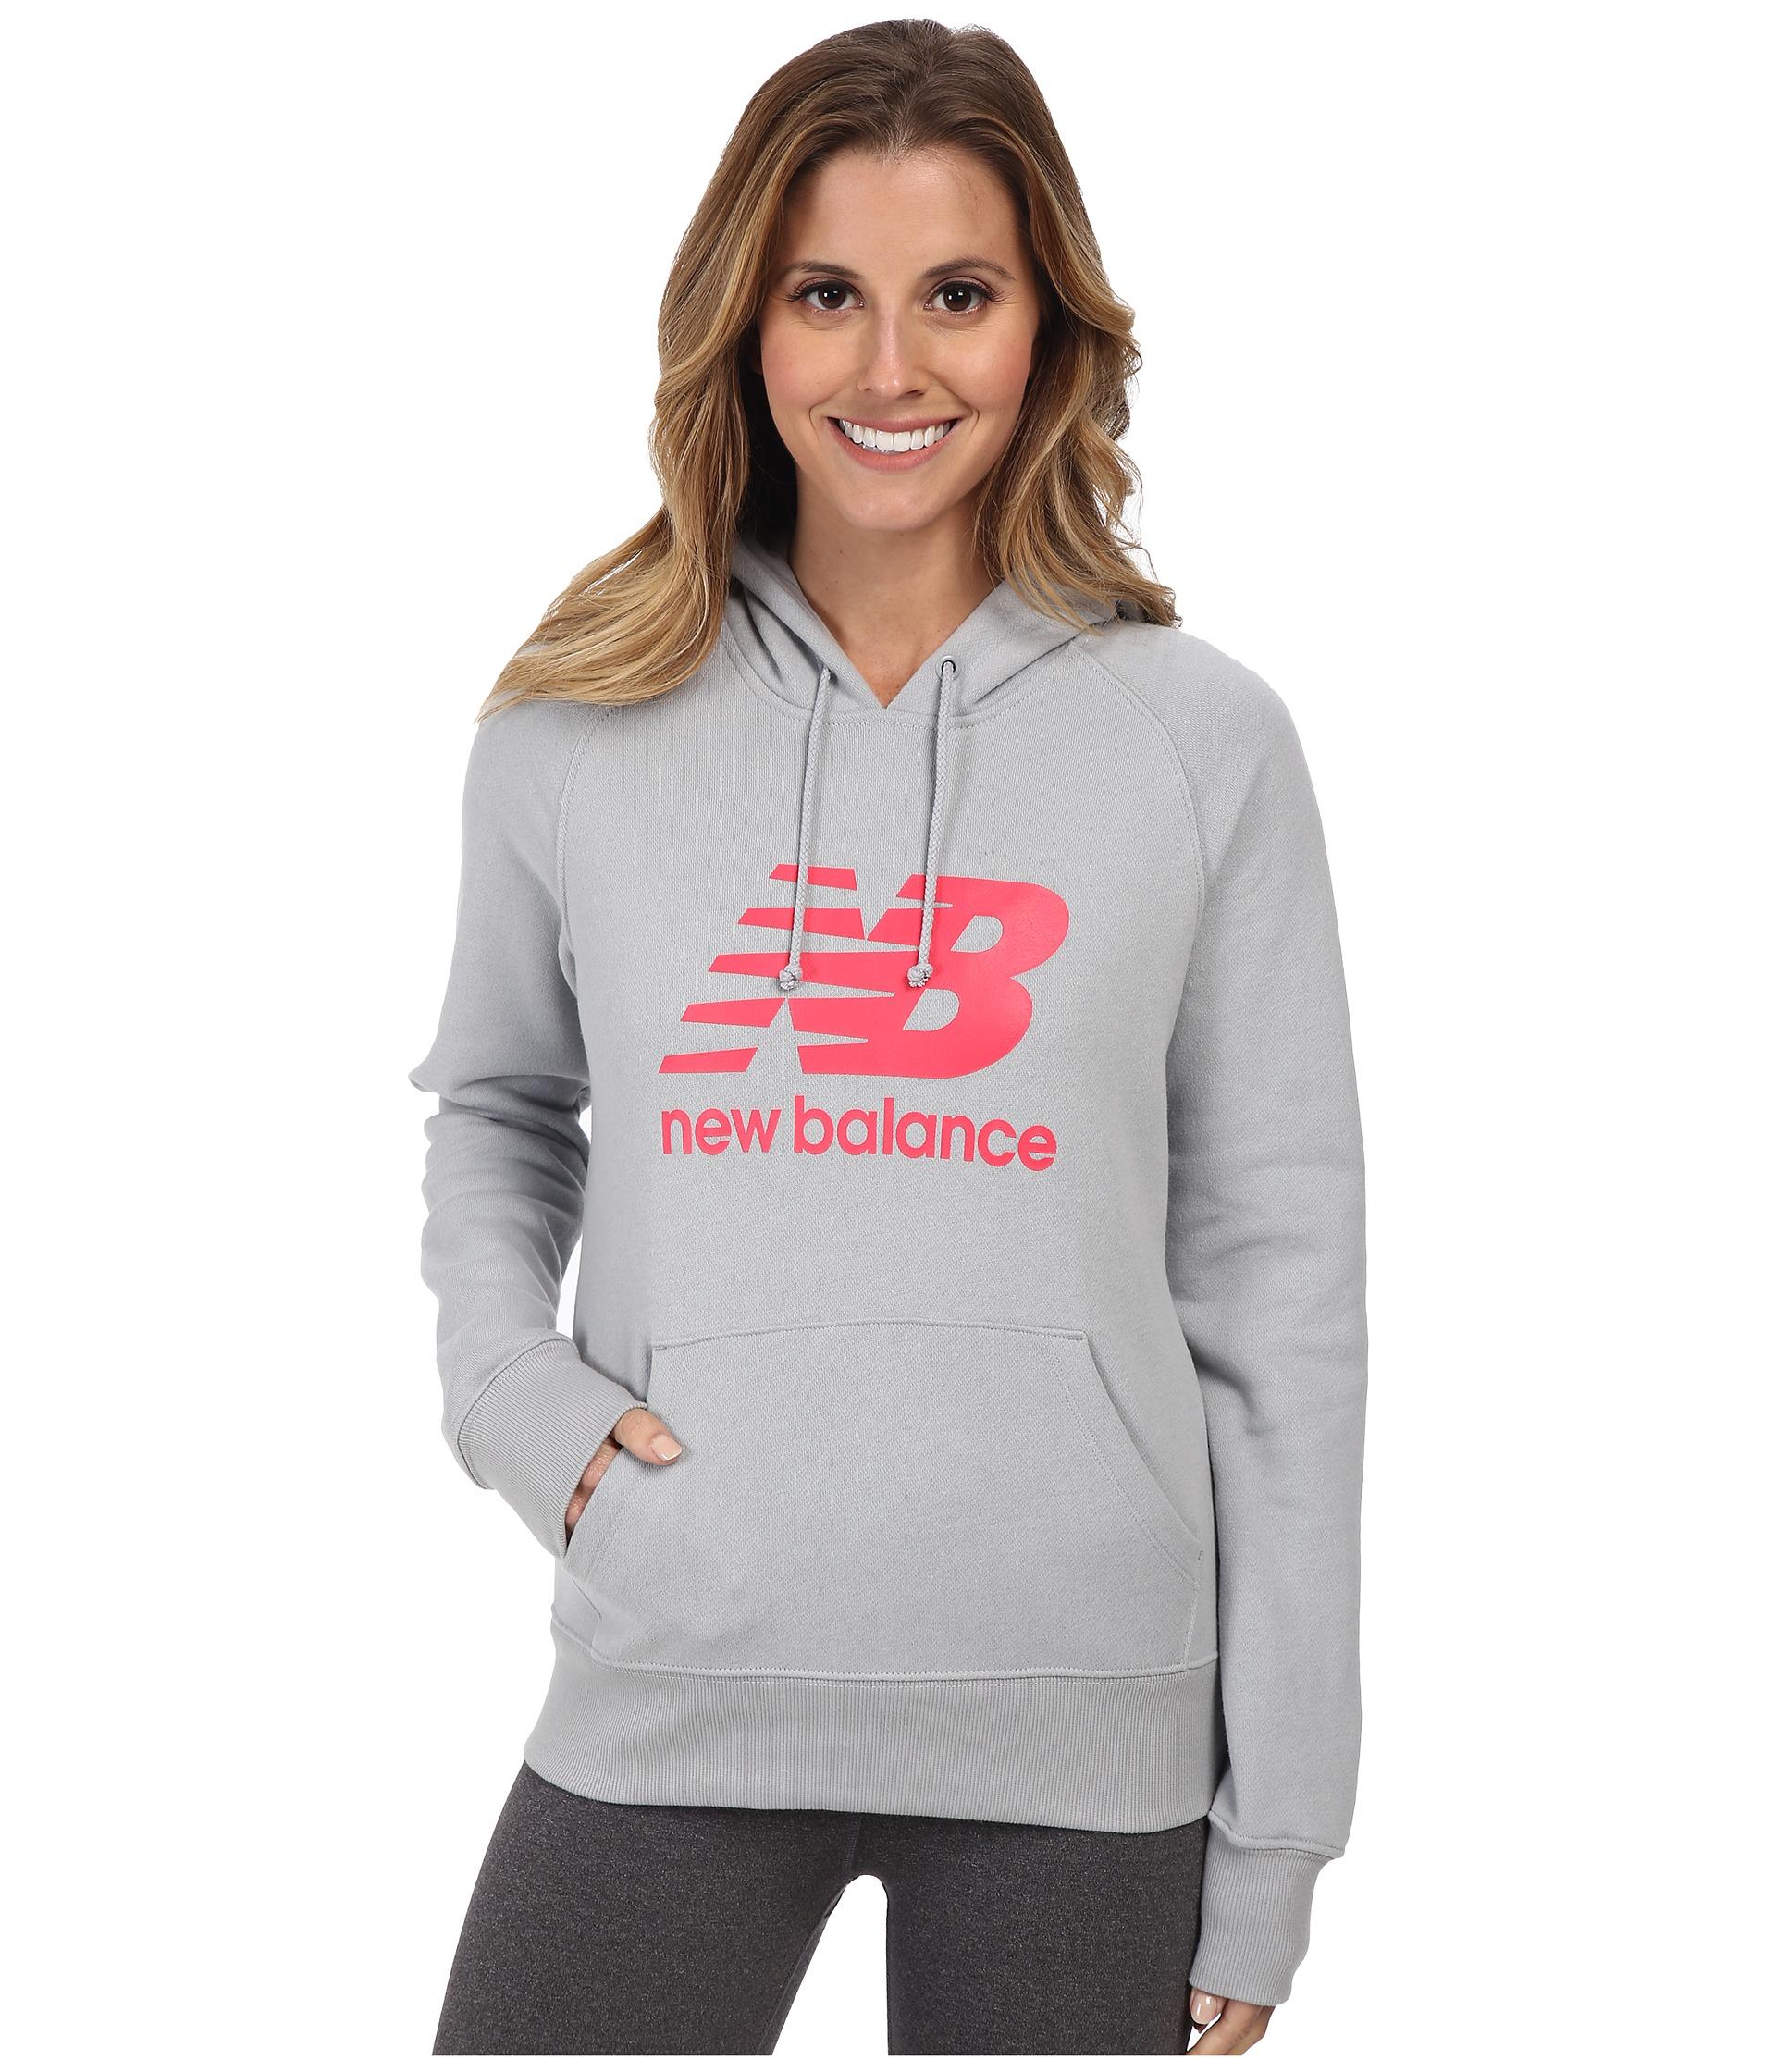 new balance women sweatshirt